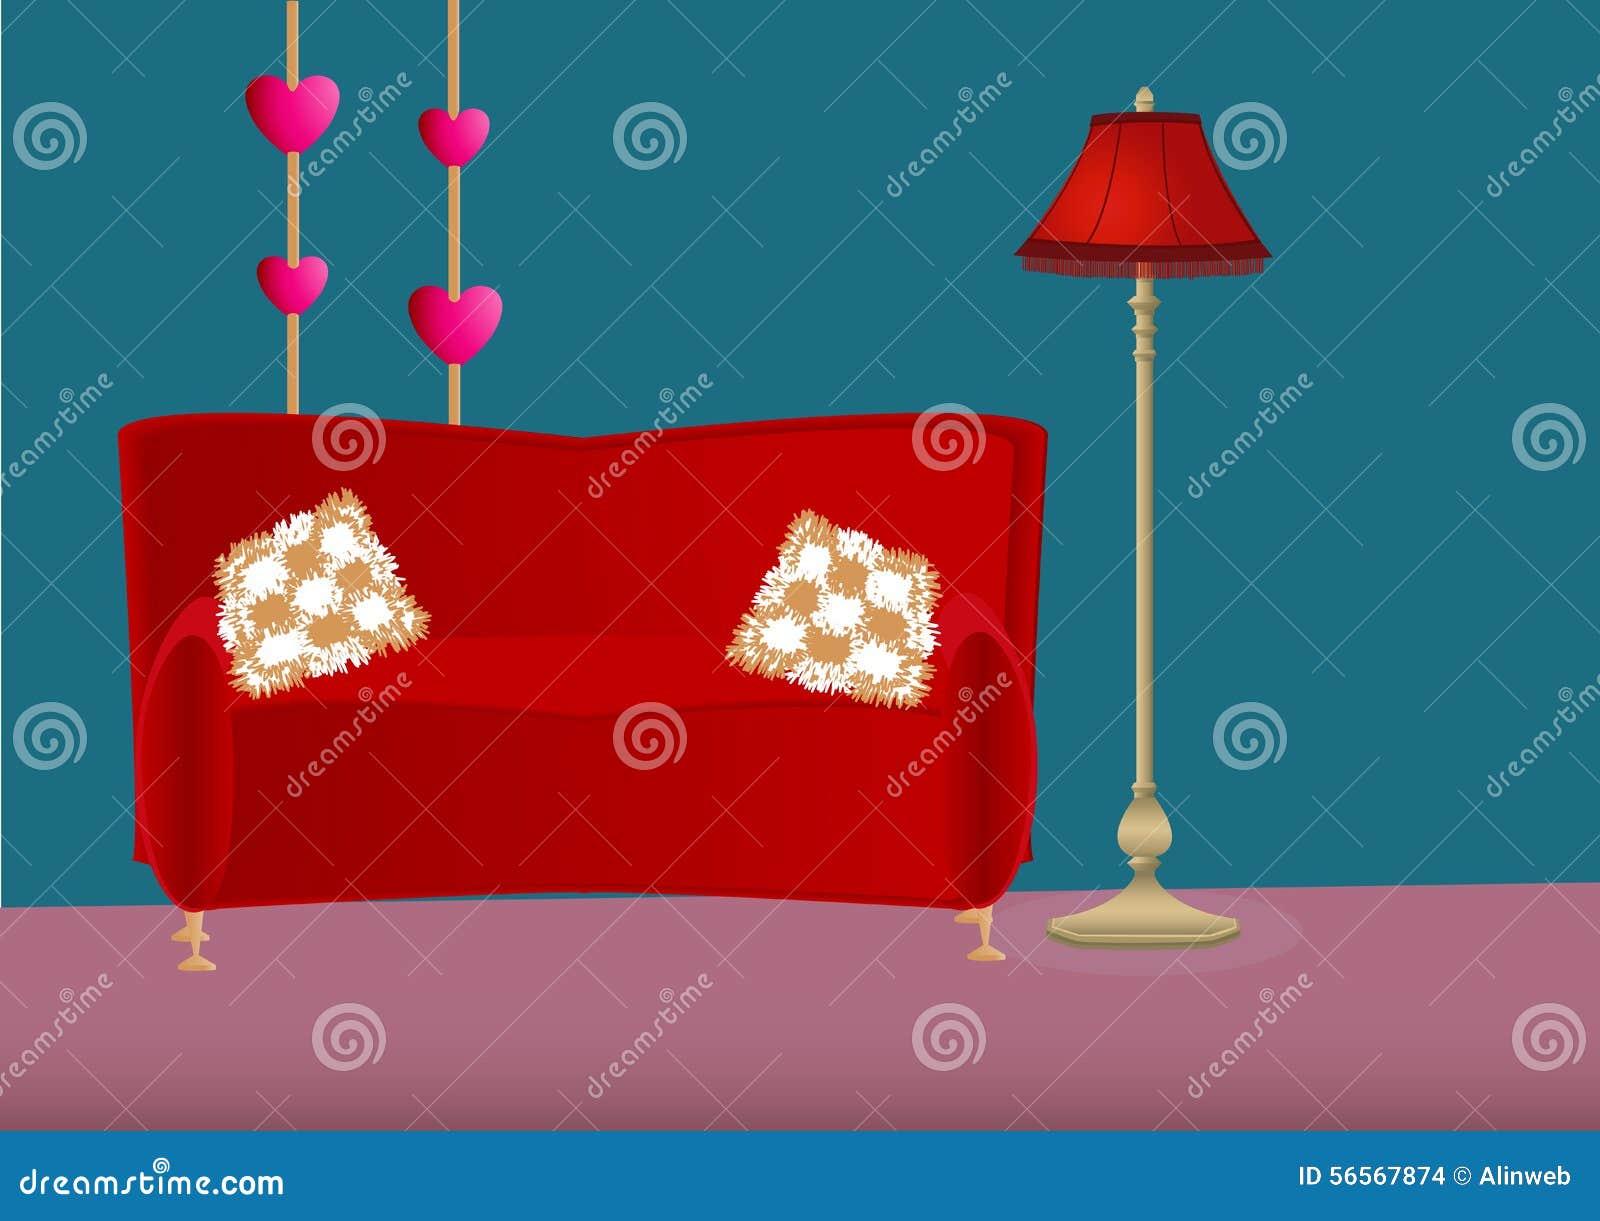 Download Κρεβατοκάμαρα κινούμενων σχεδίων με τον καναπέ, τα μαξιλάρια και το λαμπτήρα πατωμάτων Διανυσματική απεικόνιση - εικονογραφία από bedroll, βακκινίων: 56567874